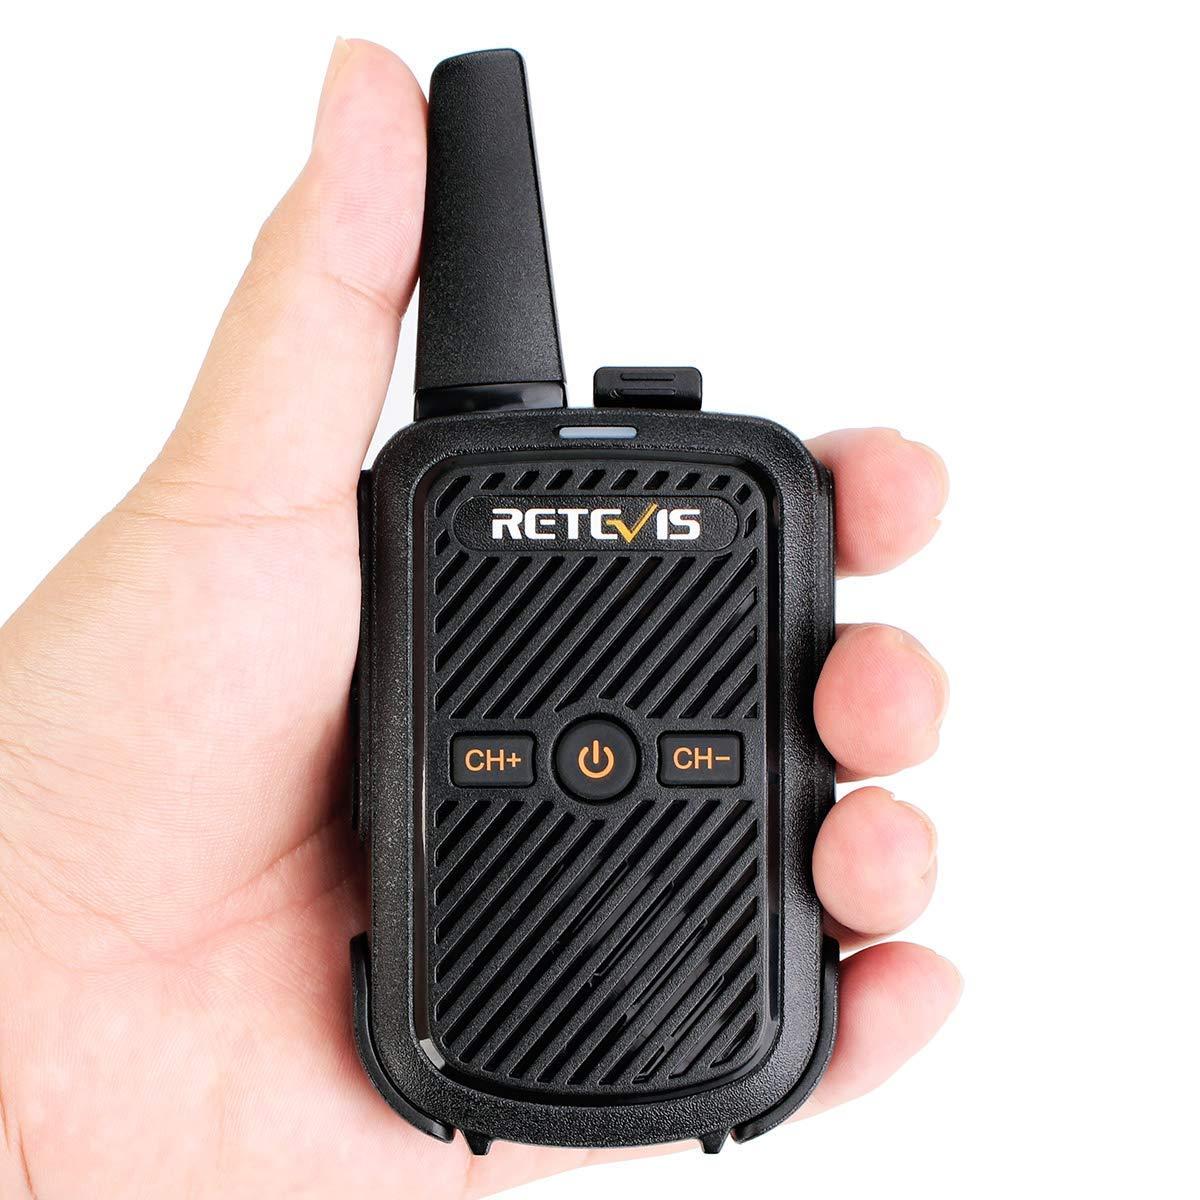 FA9144AX3 Black, 3 Pack Retevis RT15 Mini Walkie Talkie FRS Rechargeable 16 Channel Lock Vox Handsfree Ski Walkie Talkies for Kids Adults